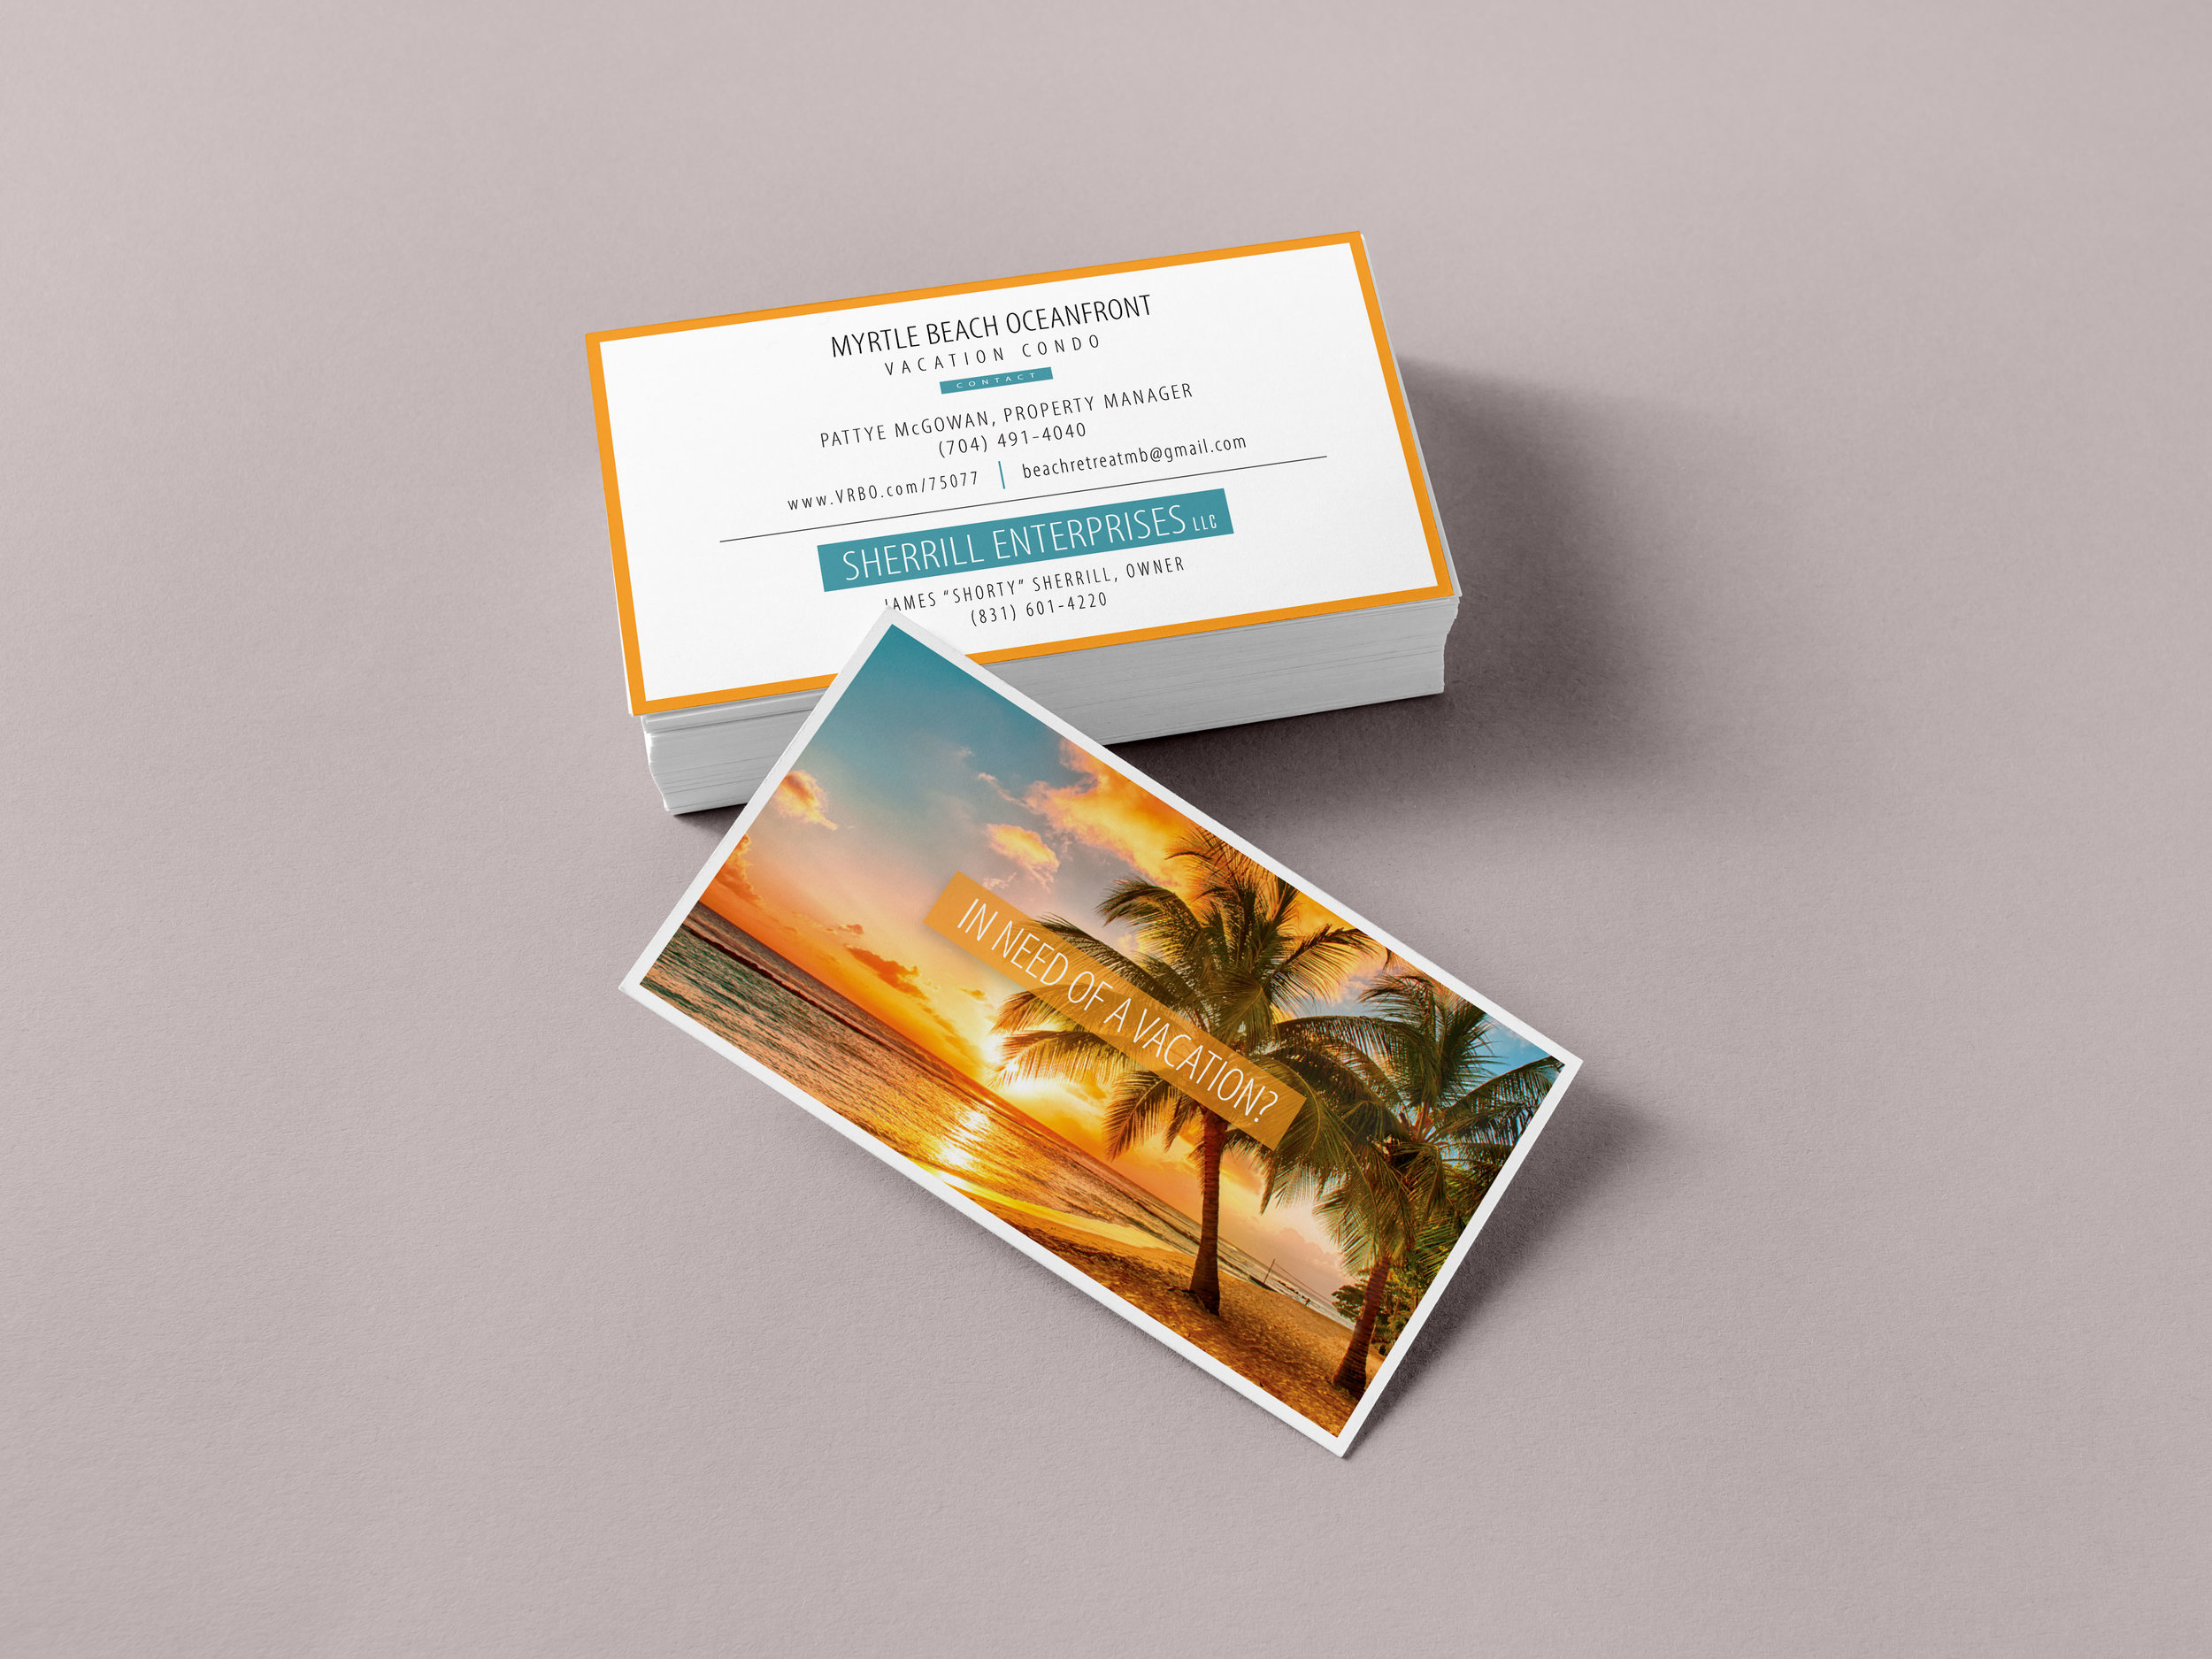 JJSherrill-Businesscard.jpg